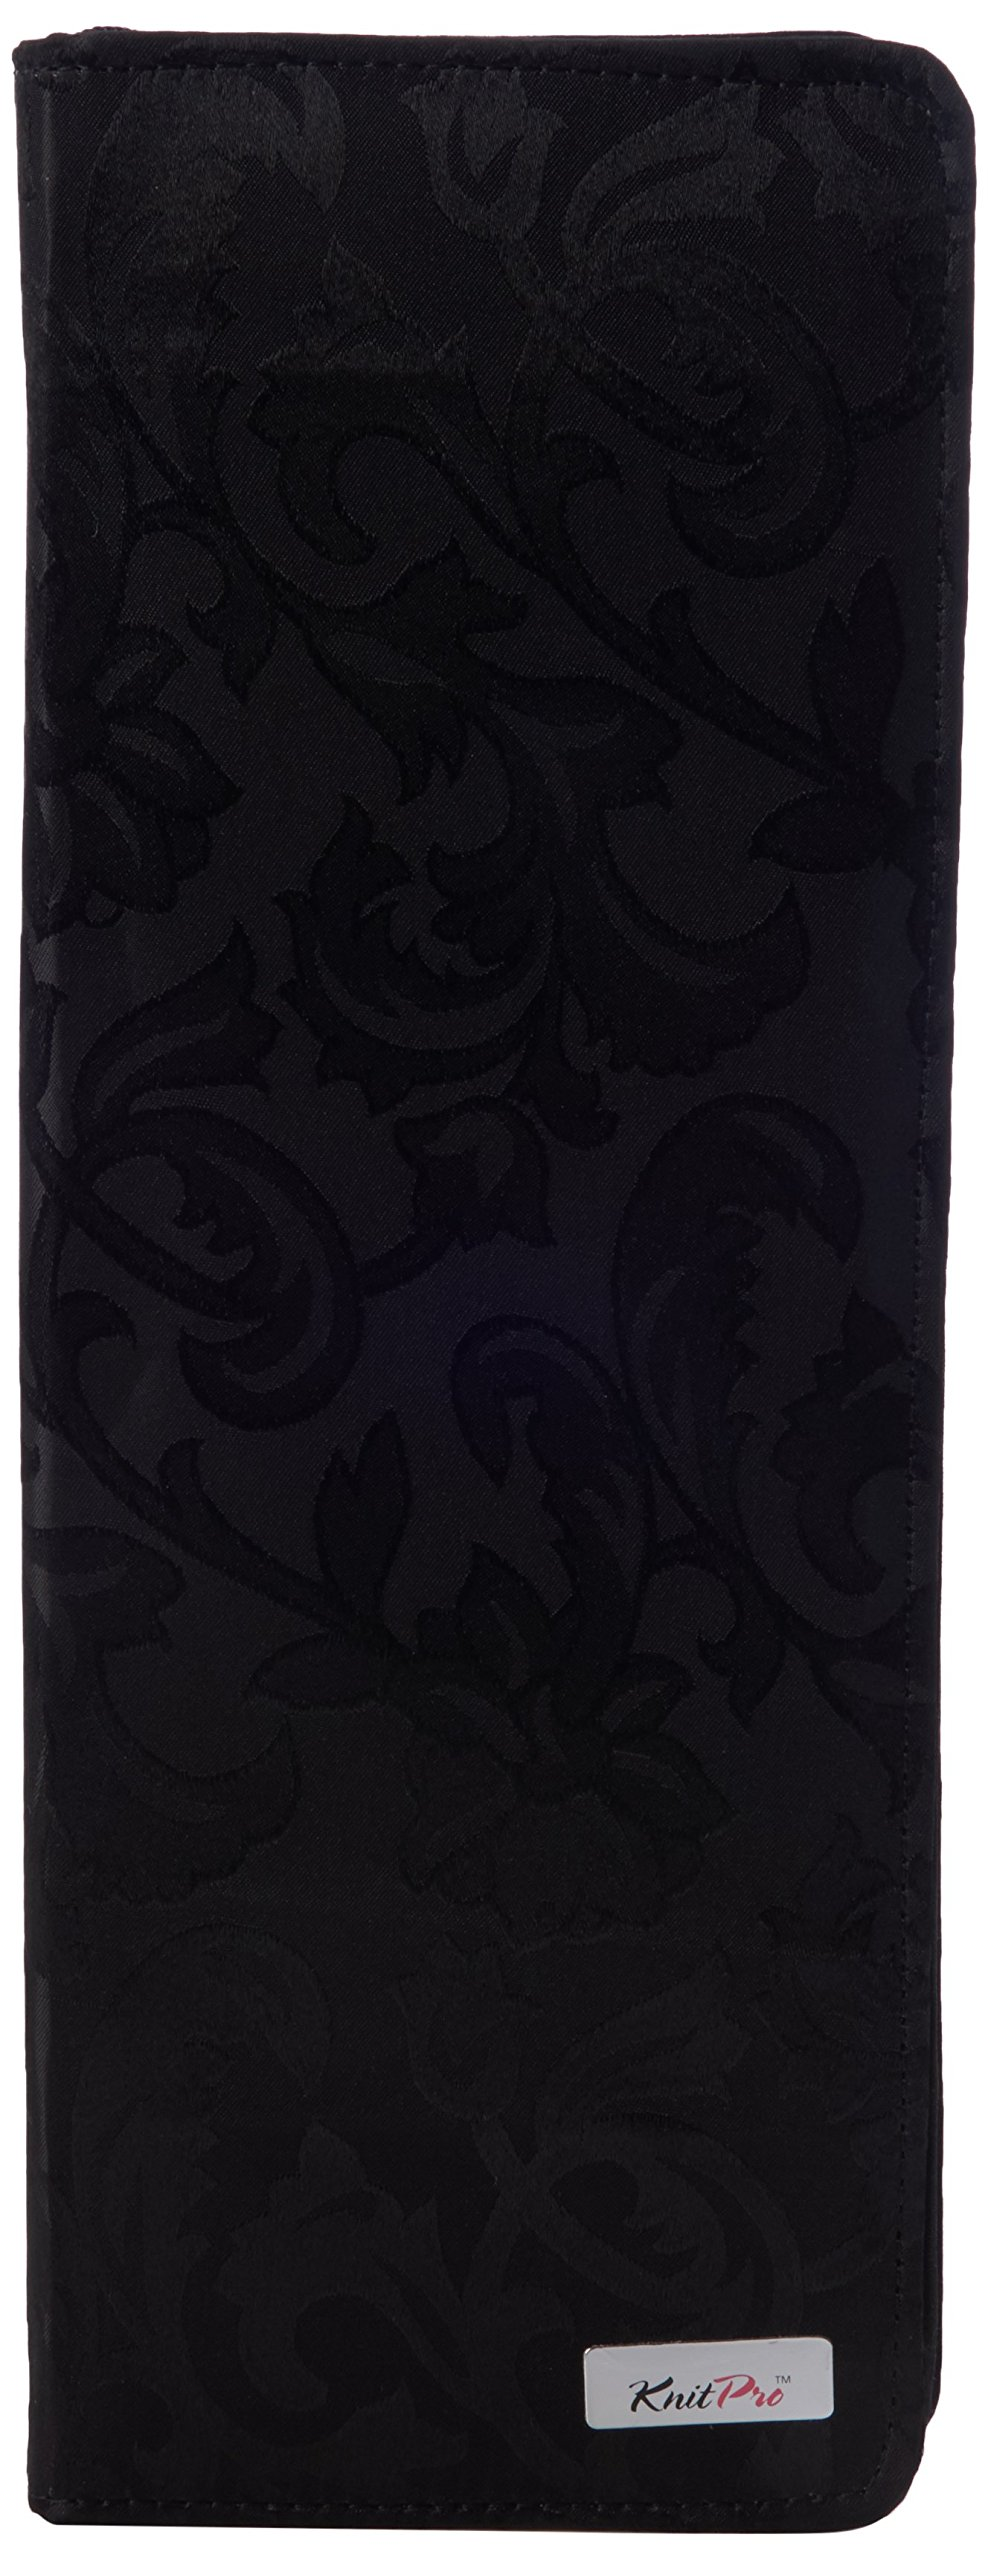 Fabric Knitting Pin Case: Black Jacquard Hard: 40cm